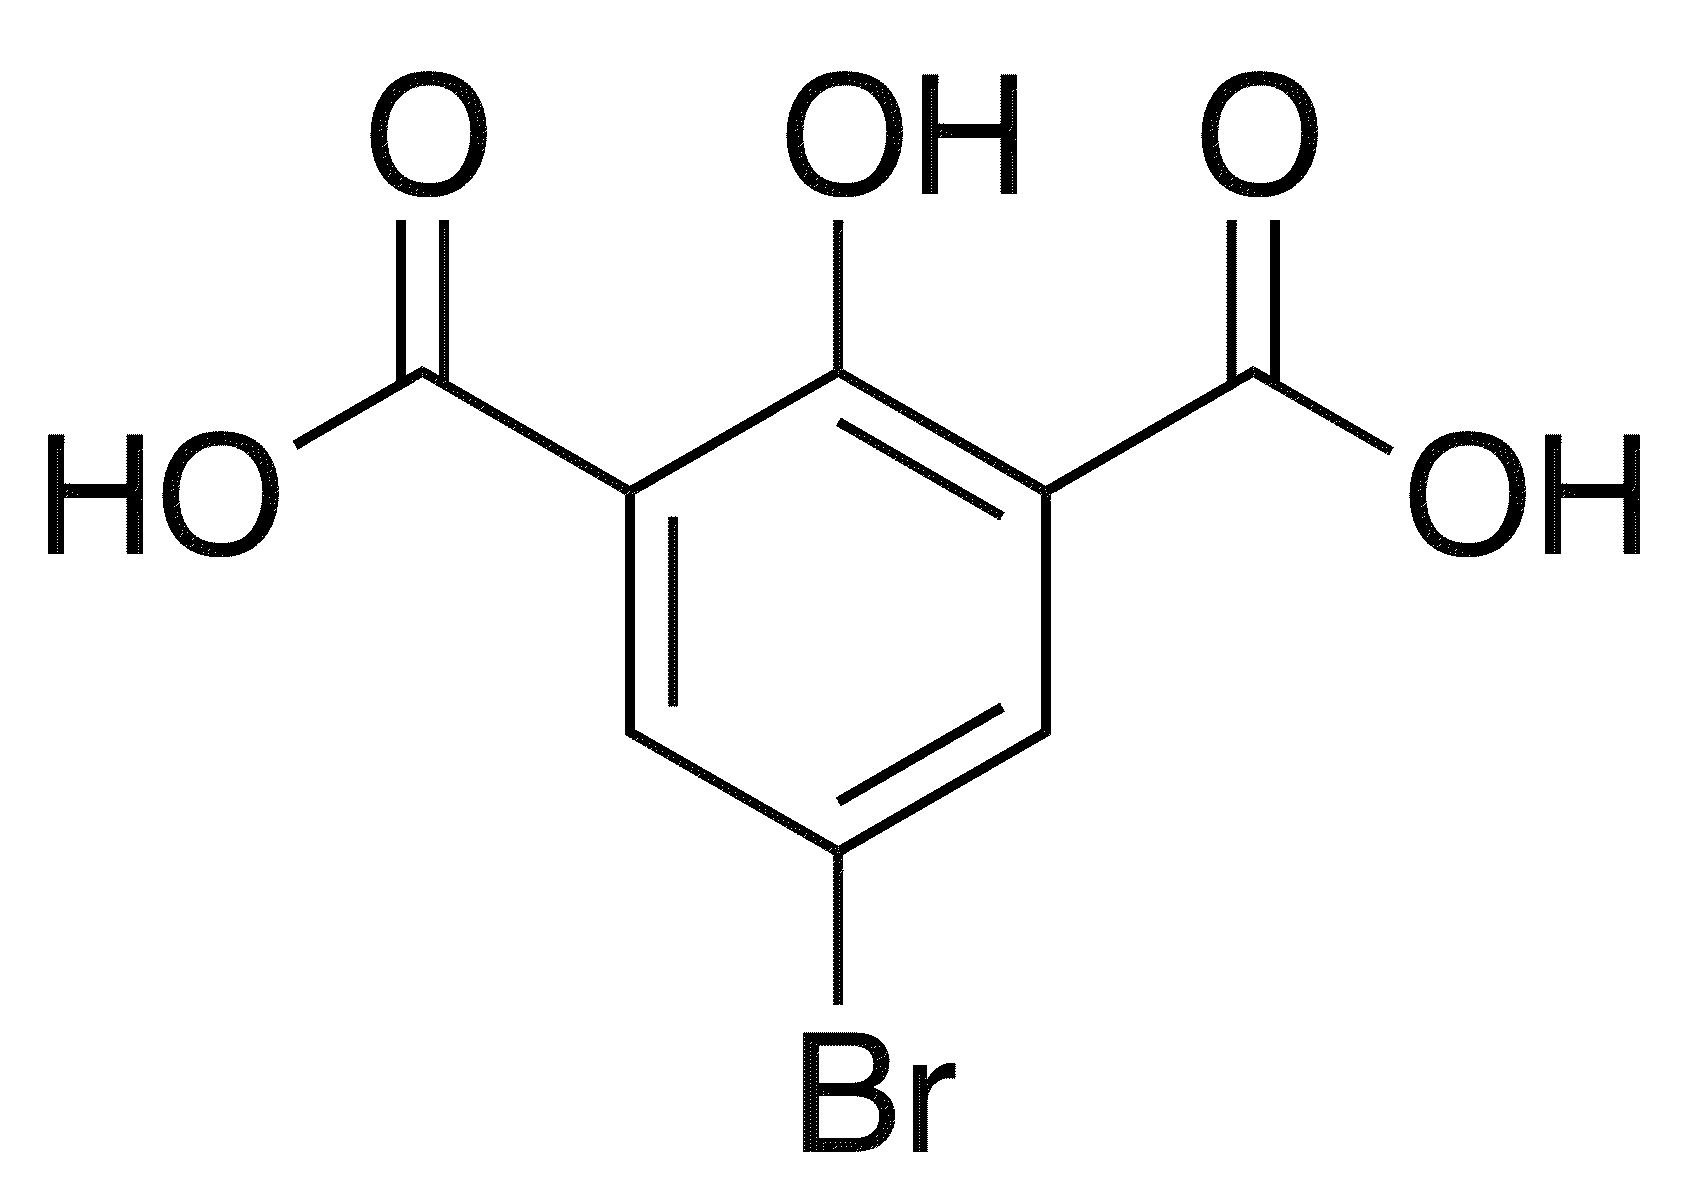 5-Bromo-2-hydroxybenzene-1,3-dicarboxylic acid